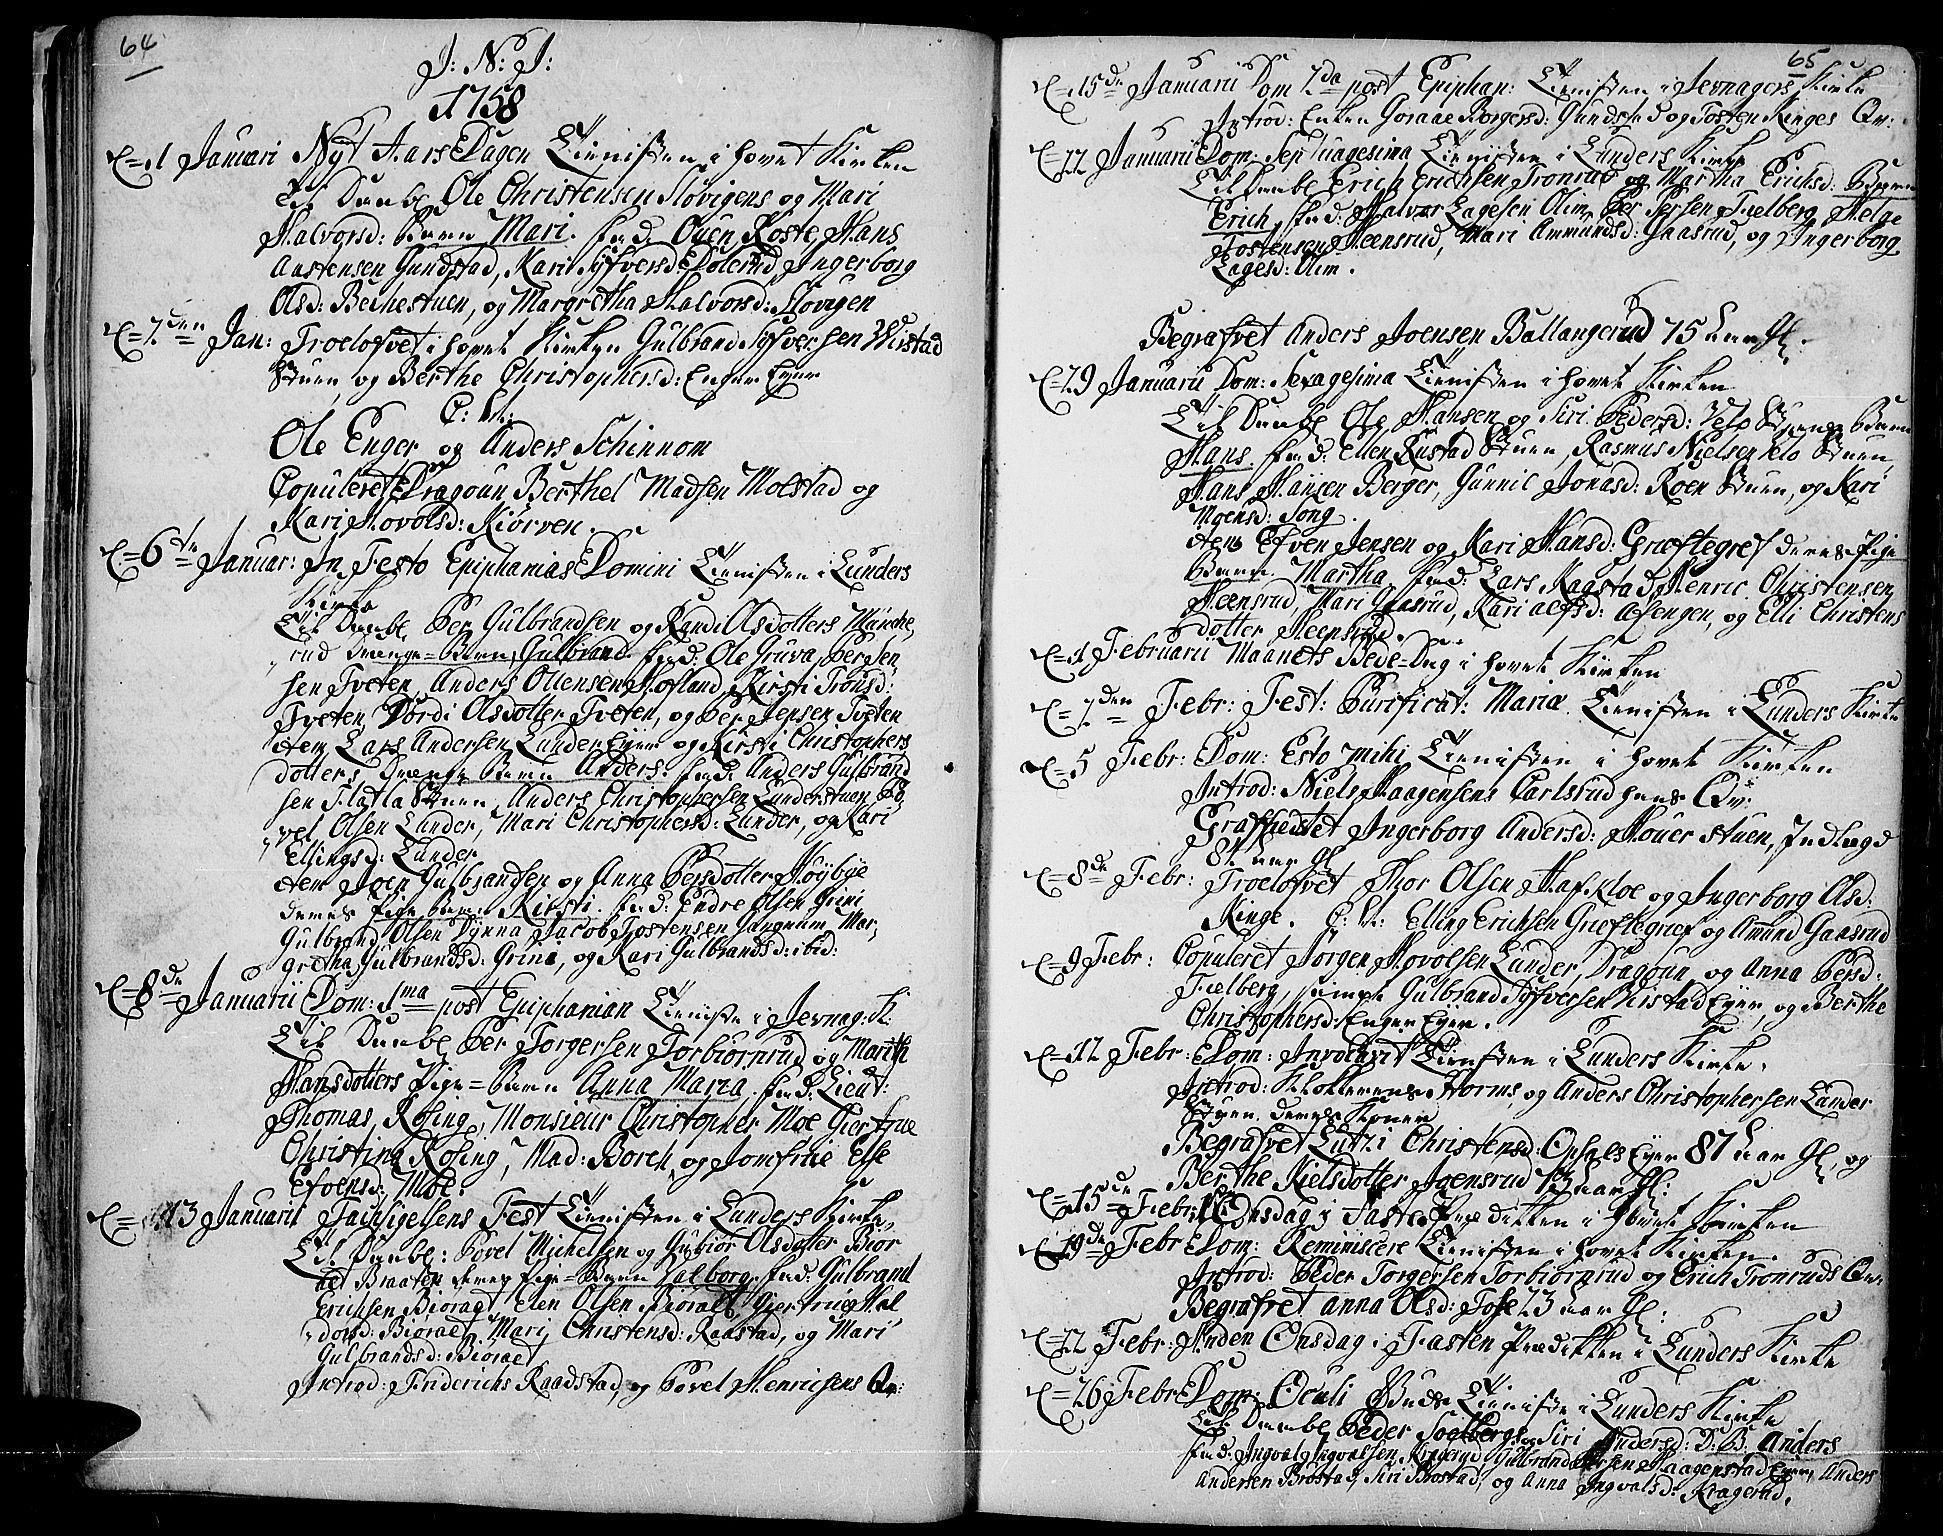 SAH, Jevnaker prestekontor, Ministerialbok nr. 3, 1752-1799, s. 64-65